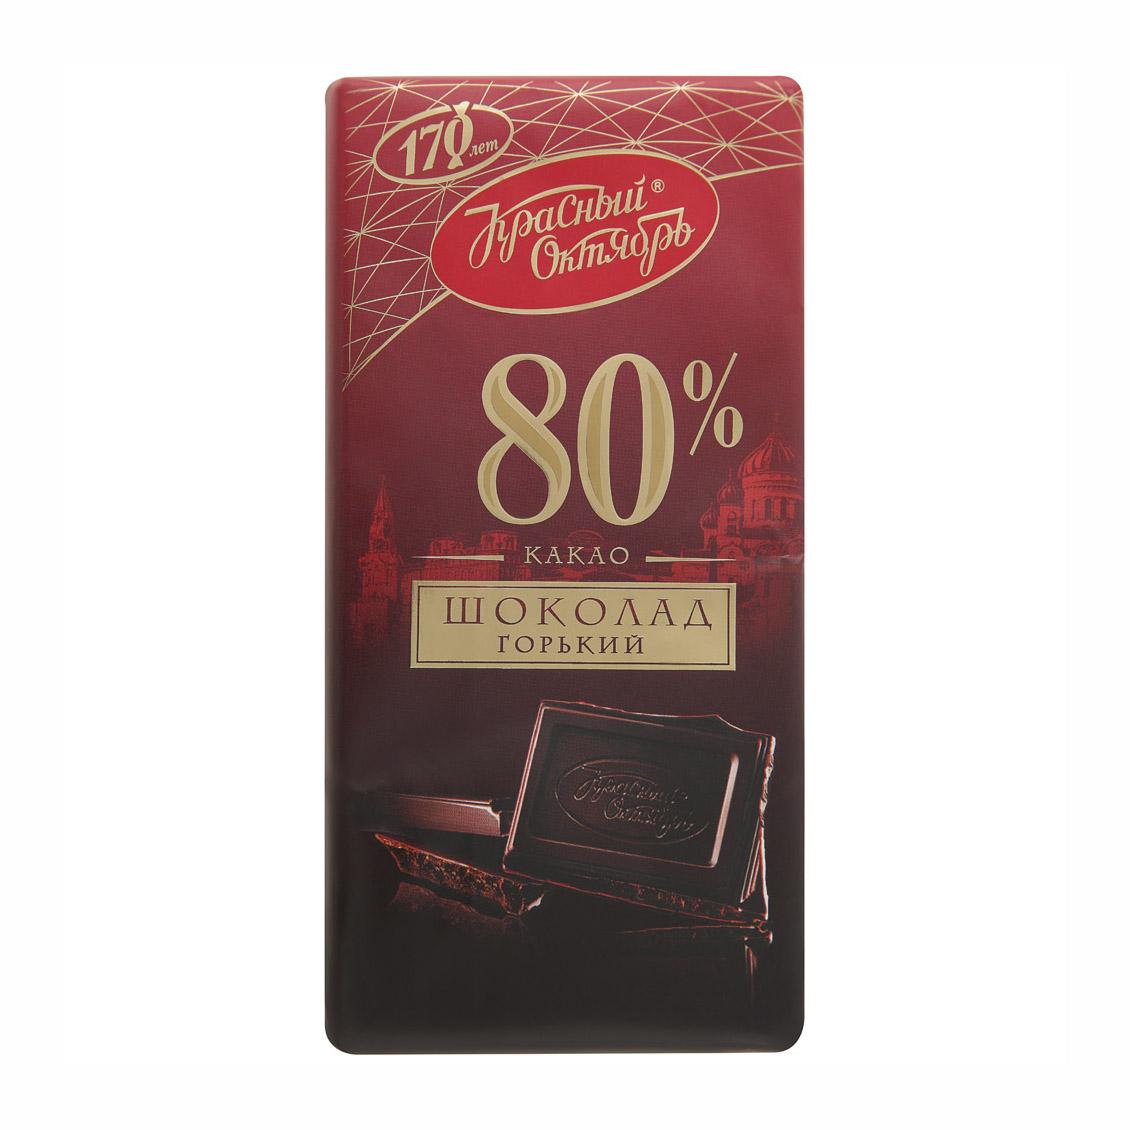 шоколад klaus горький 80% какао 100 г Шоколад Красный Октябрь горький 80% какао 75 г